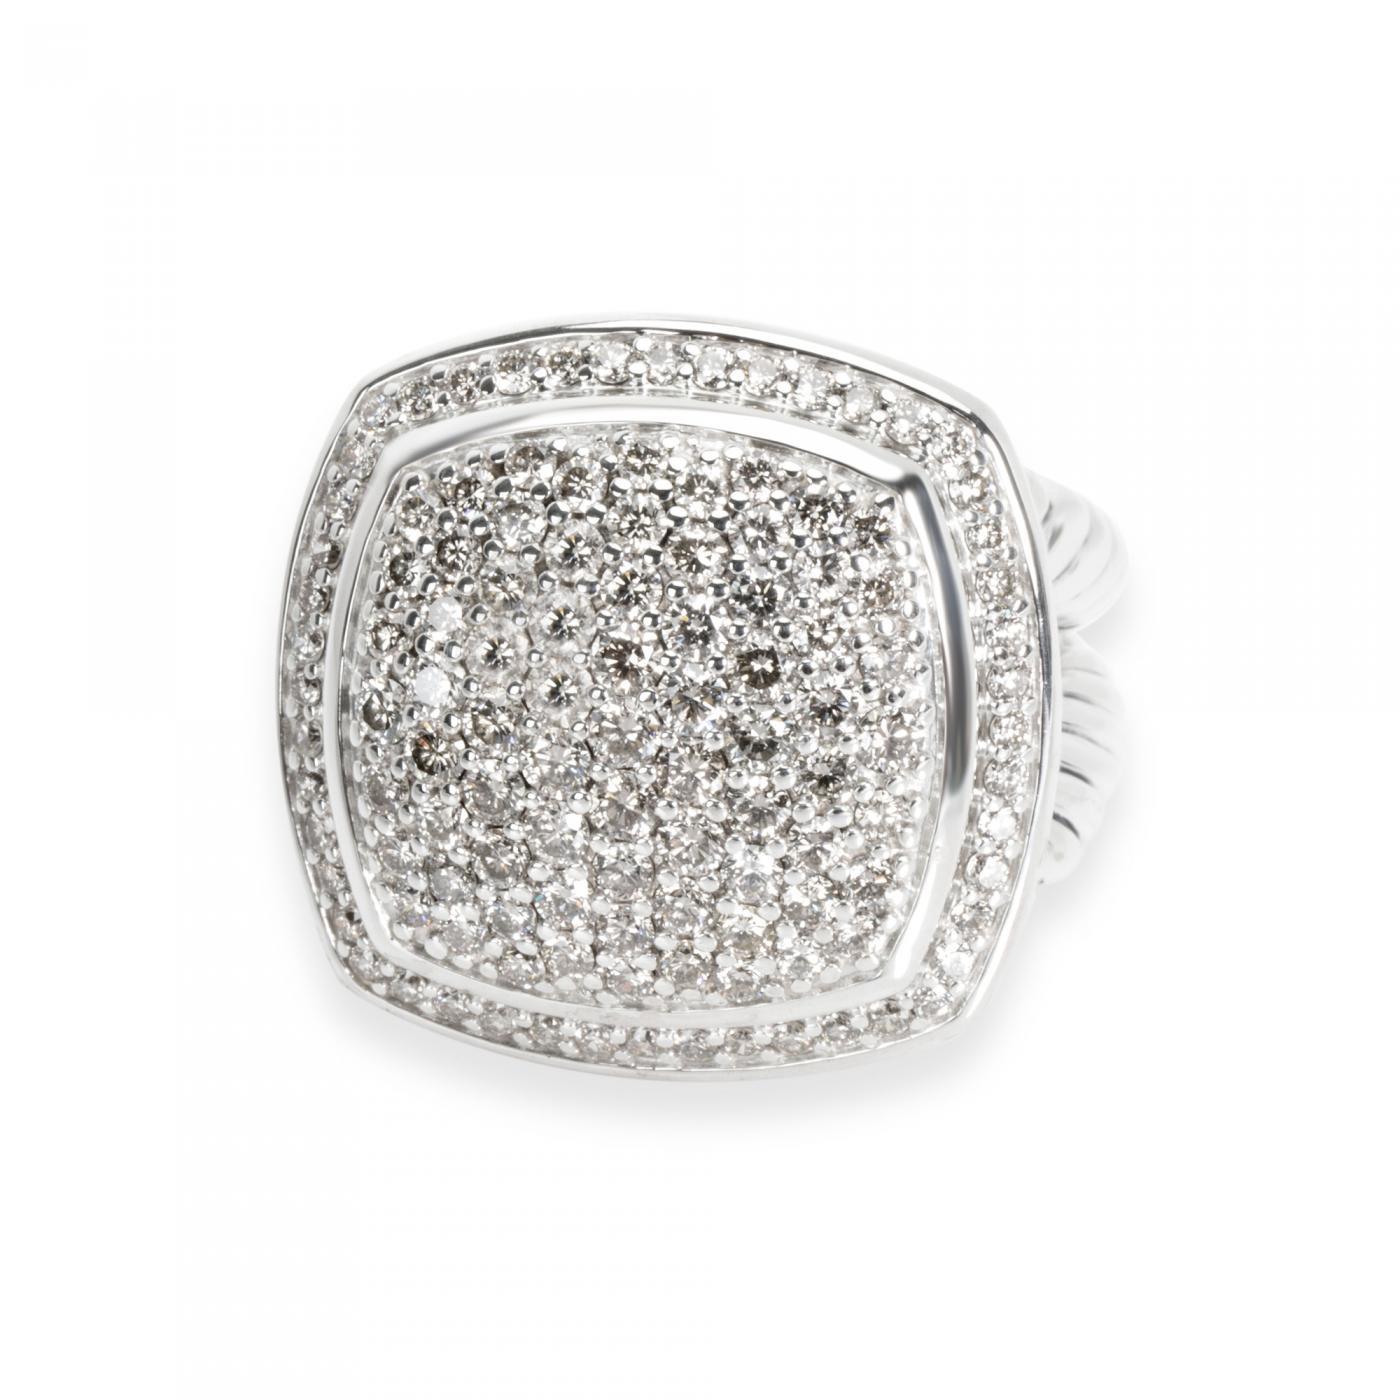 David Yurman David Yurman Albion Diamond Ring In Sterling Silver 1 53 Ctw